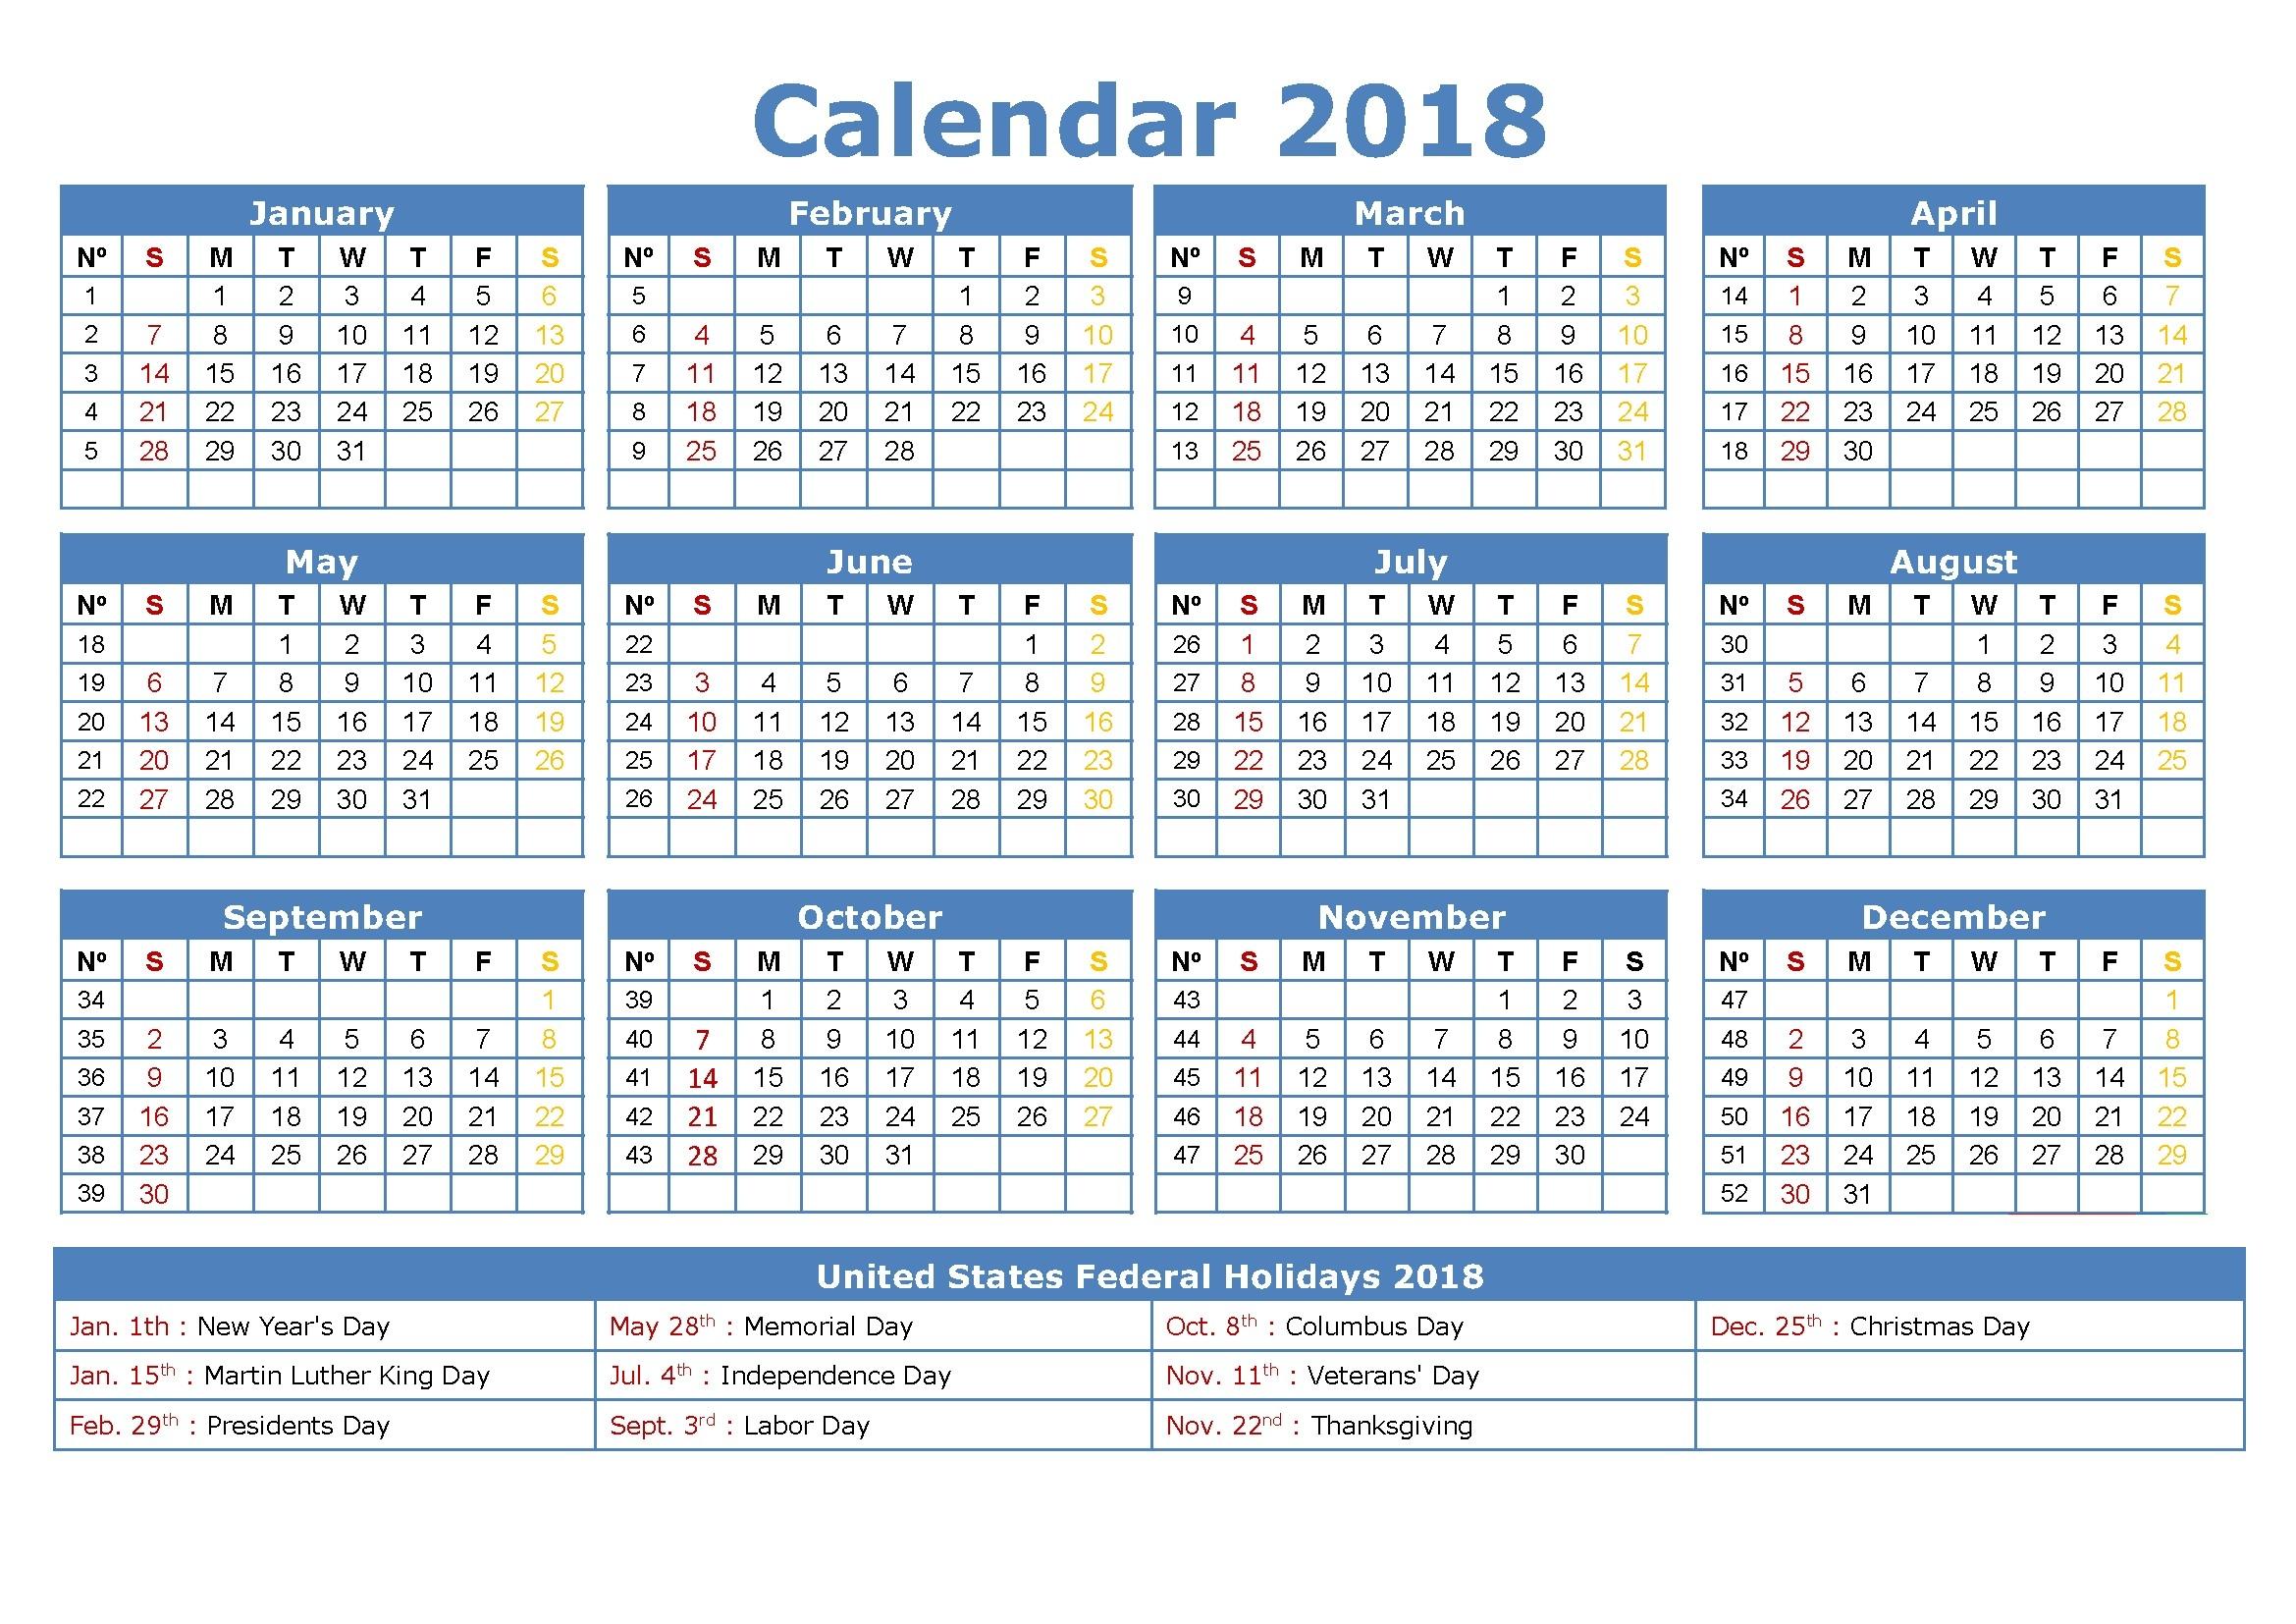 free printable employee attendance calendar 2018  Free Employee Attendance Calendar 2018  erdferdf